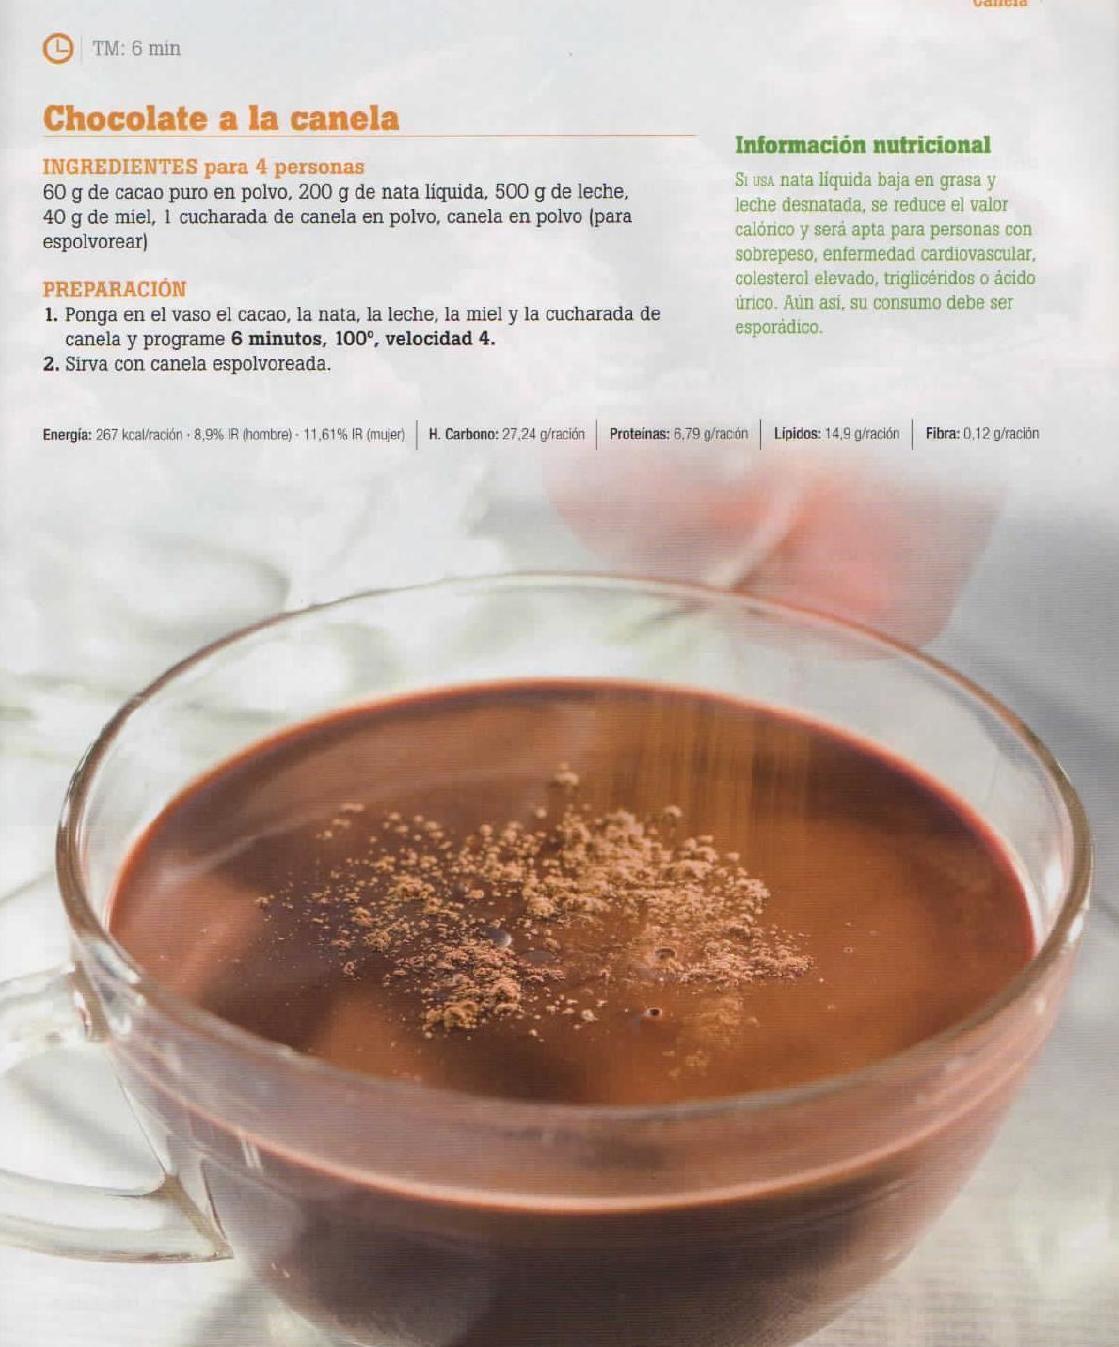 #ClippedOnIssuu desde Revista thermomix nº17 nueva cocina de invierno